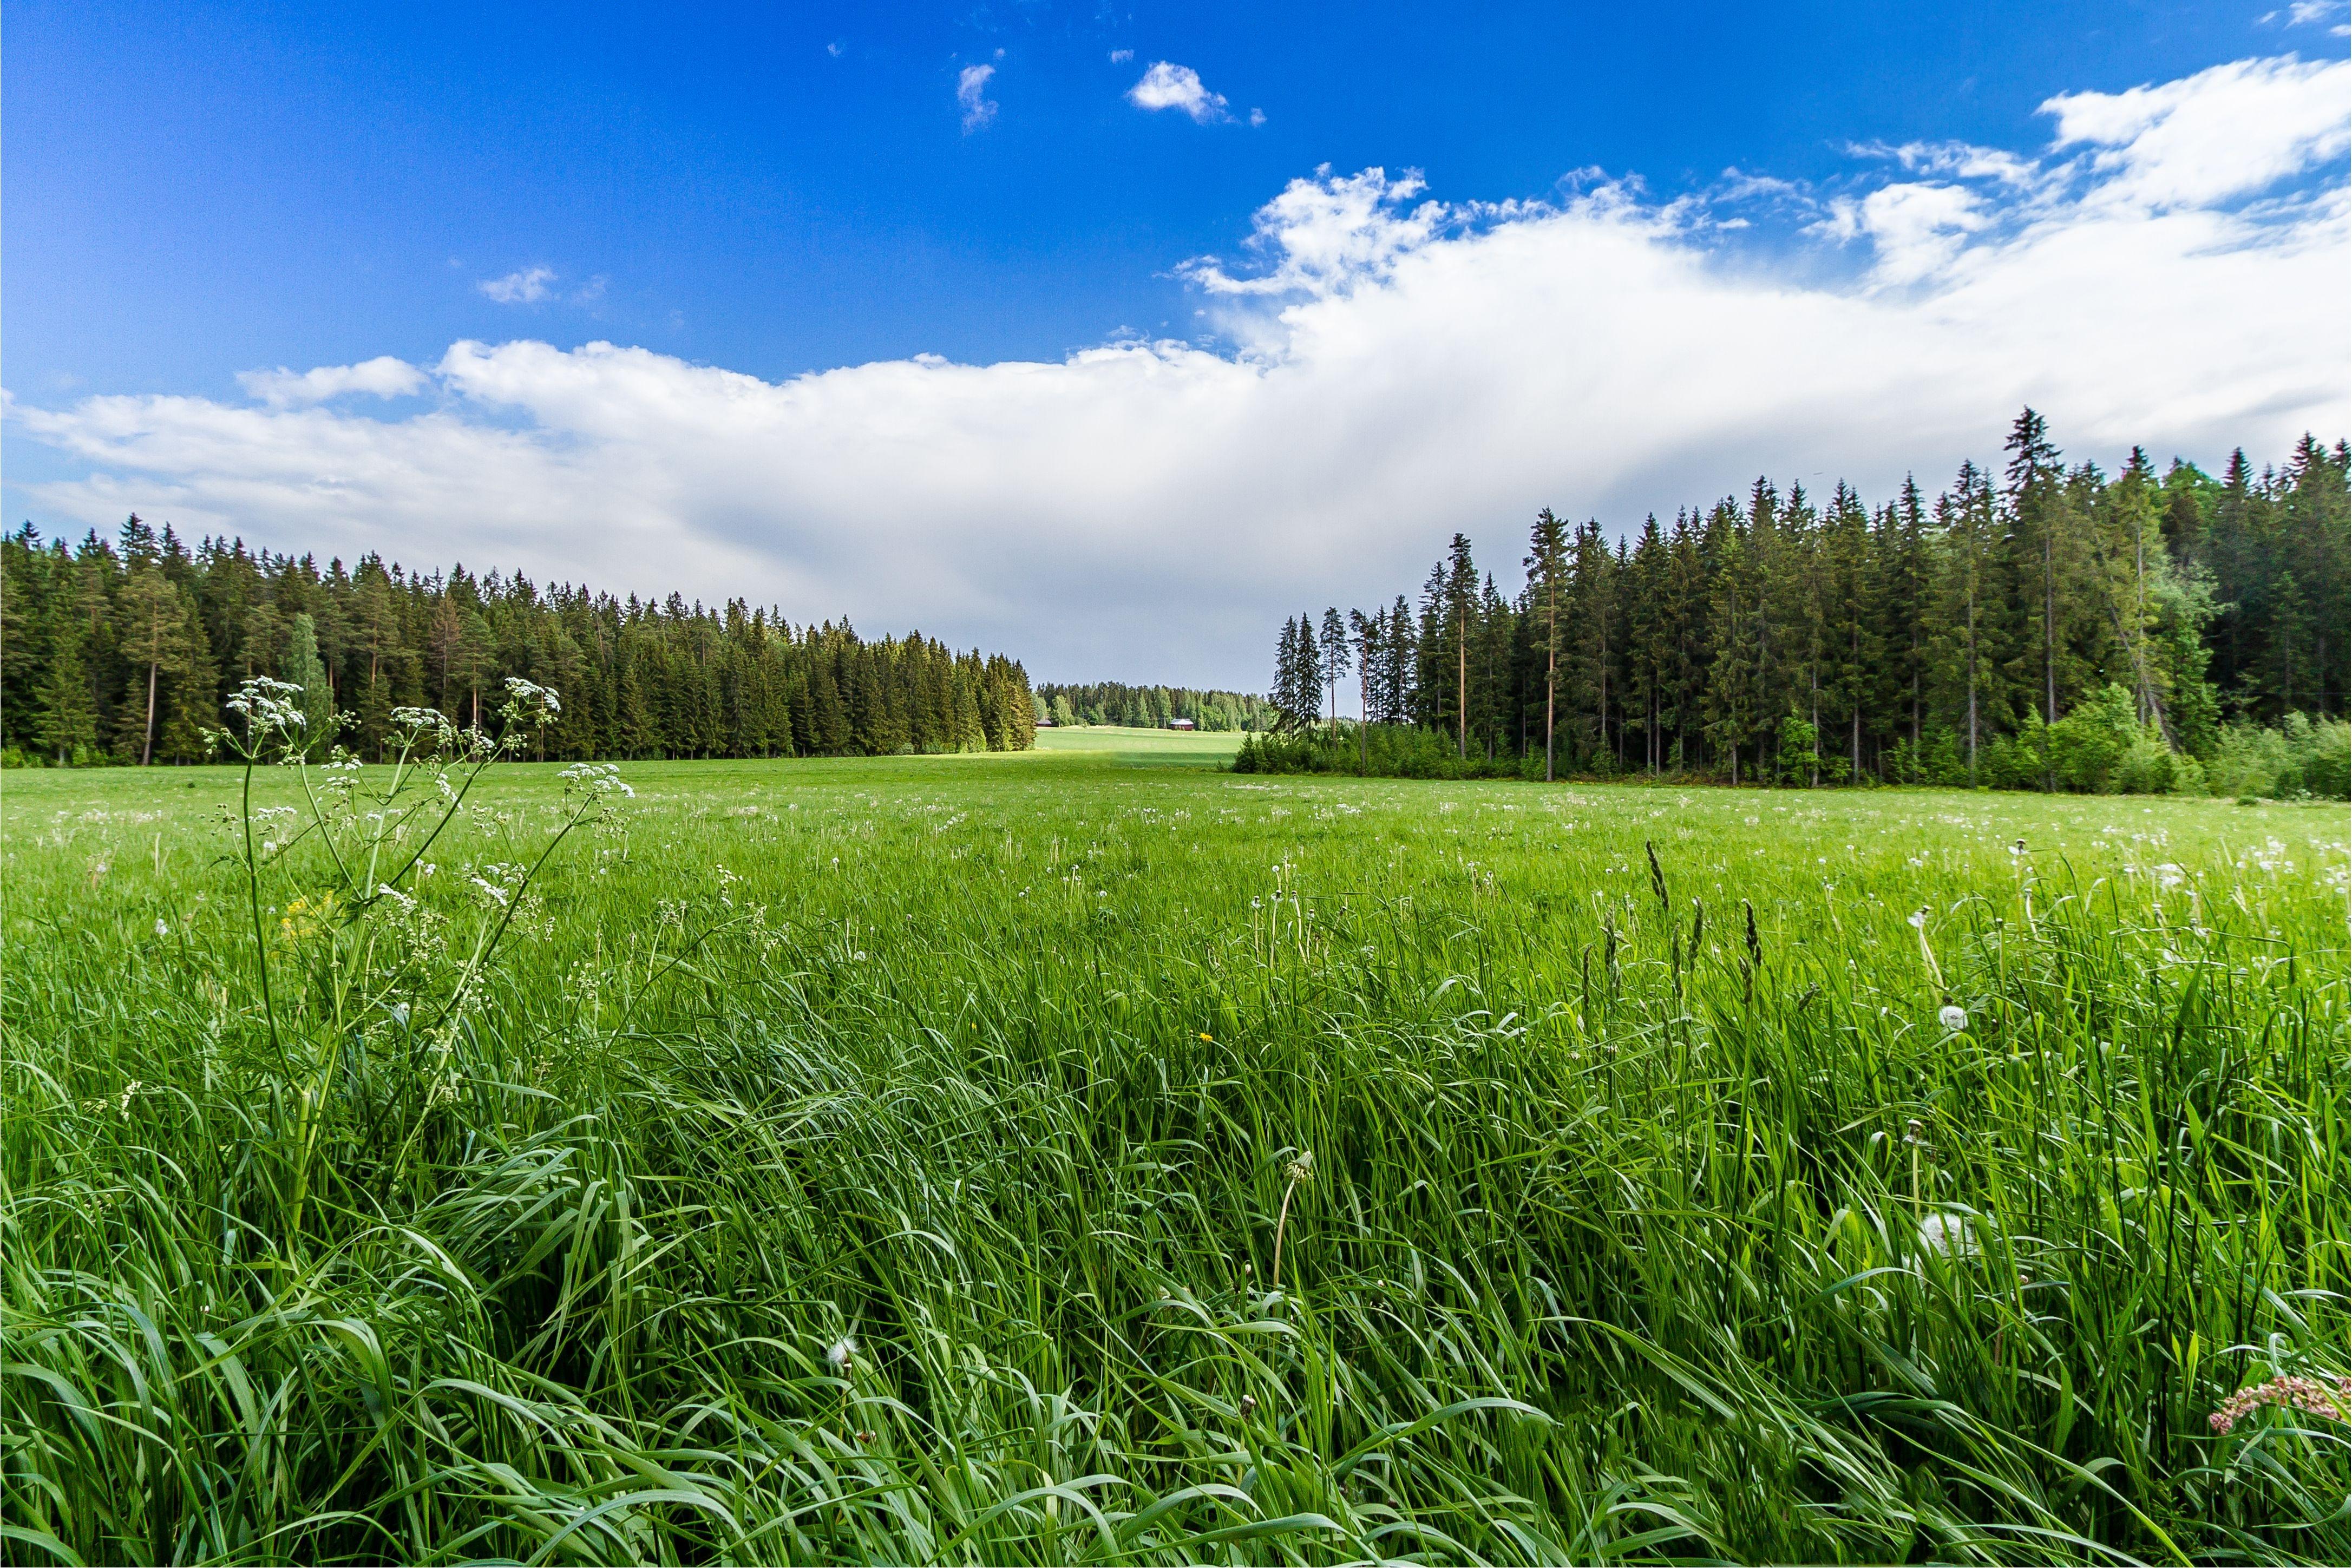 bush field grass sky - photo #11